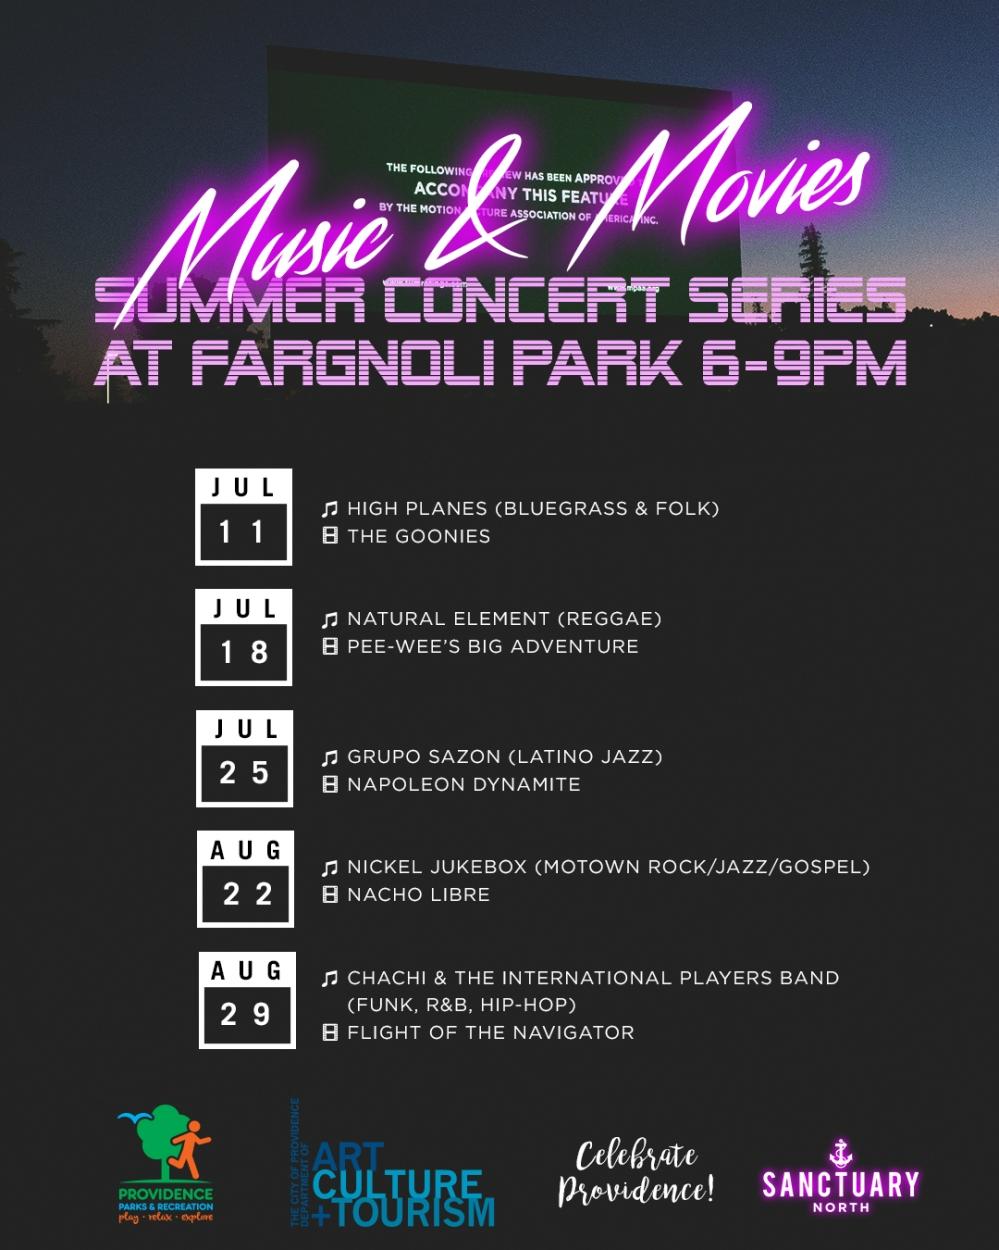 [INSTA] North Music & Movies Lineup